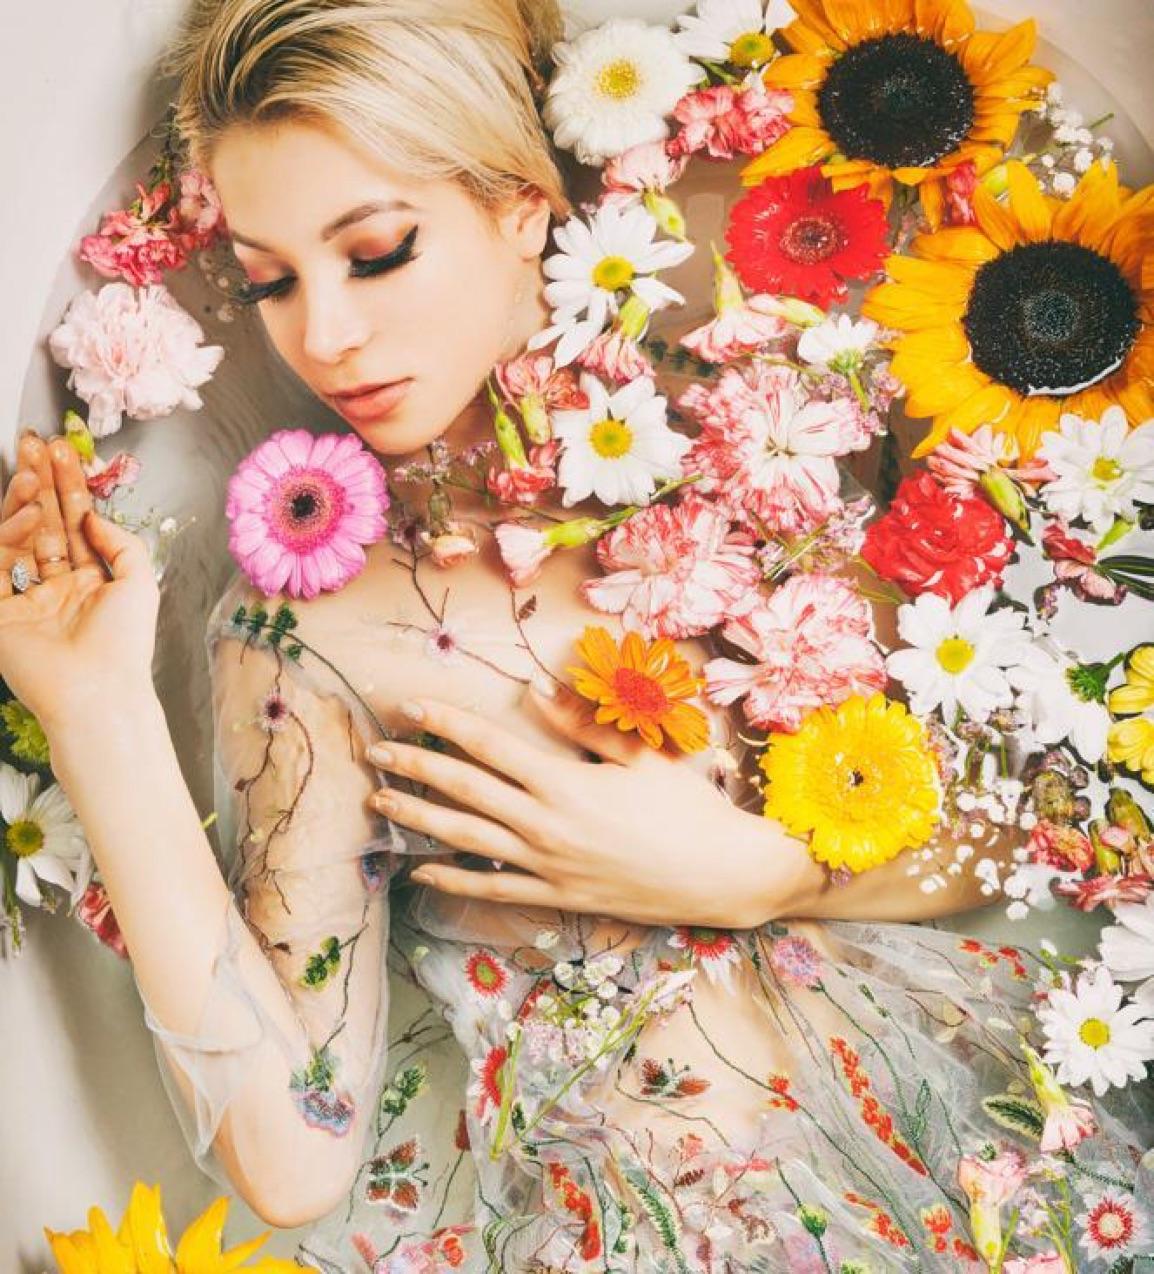 Lilly-Iaschelcic-model-UK